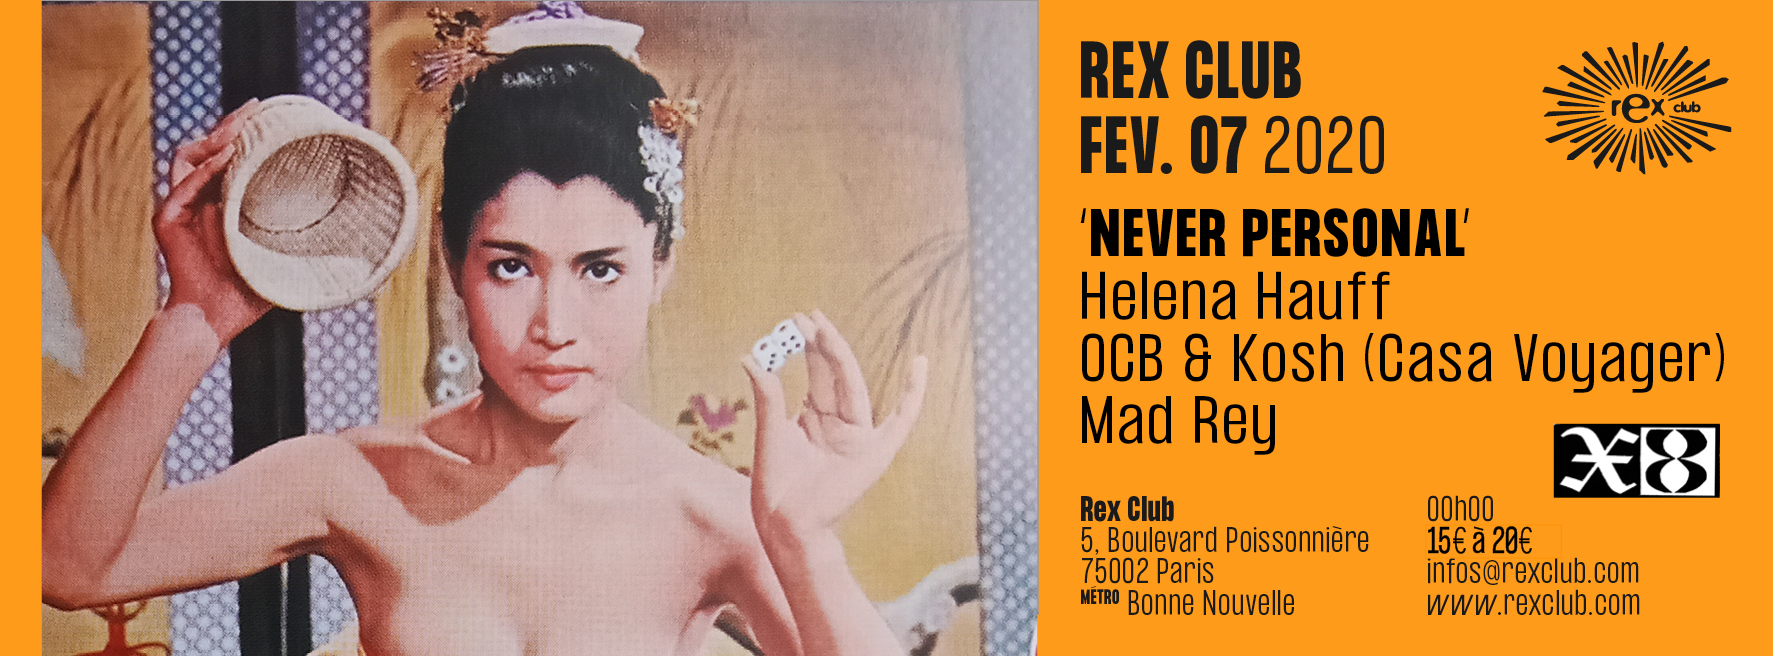 Mad Rey - Never Personal: Helena Hauff, OCB & Kosh (Casa Voyager